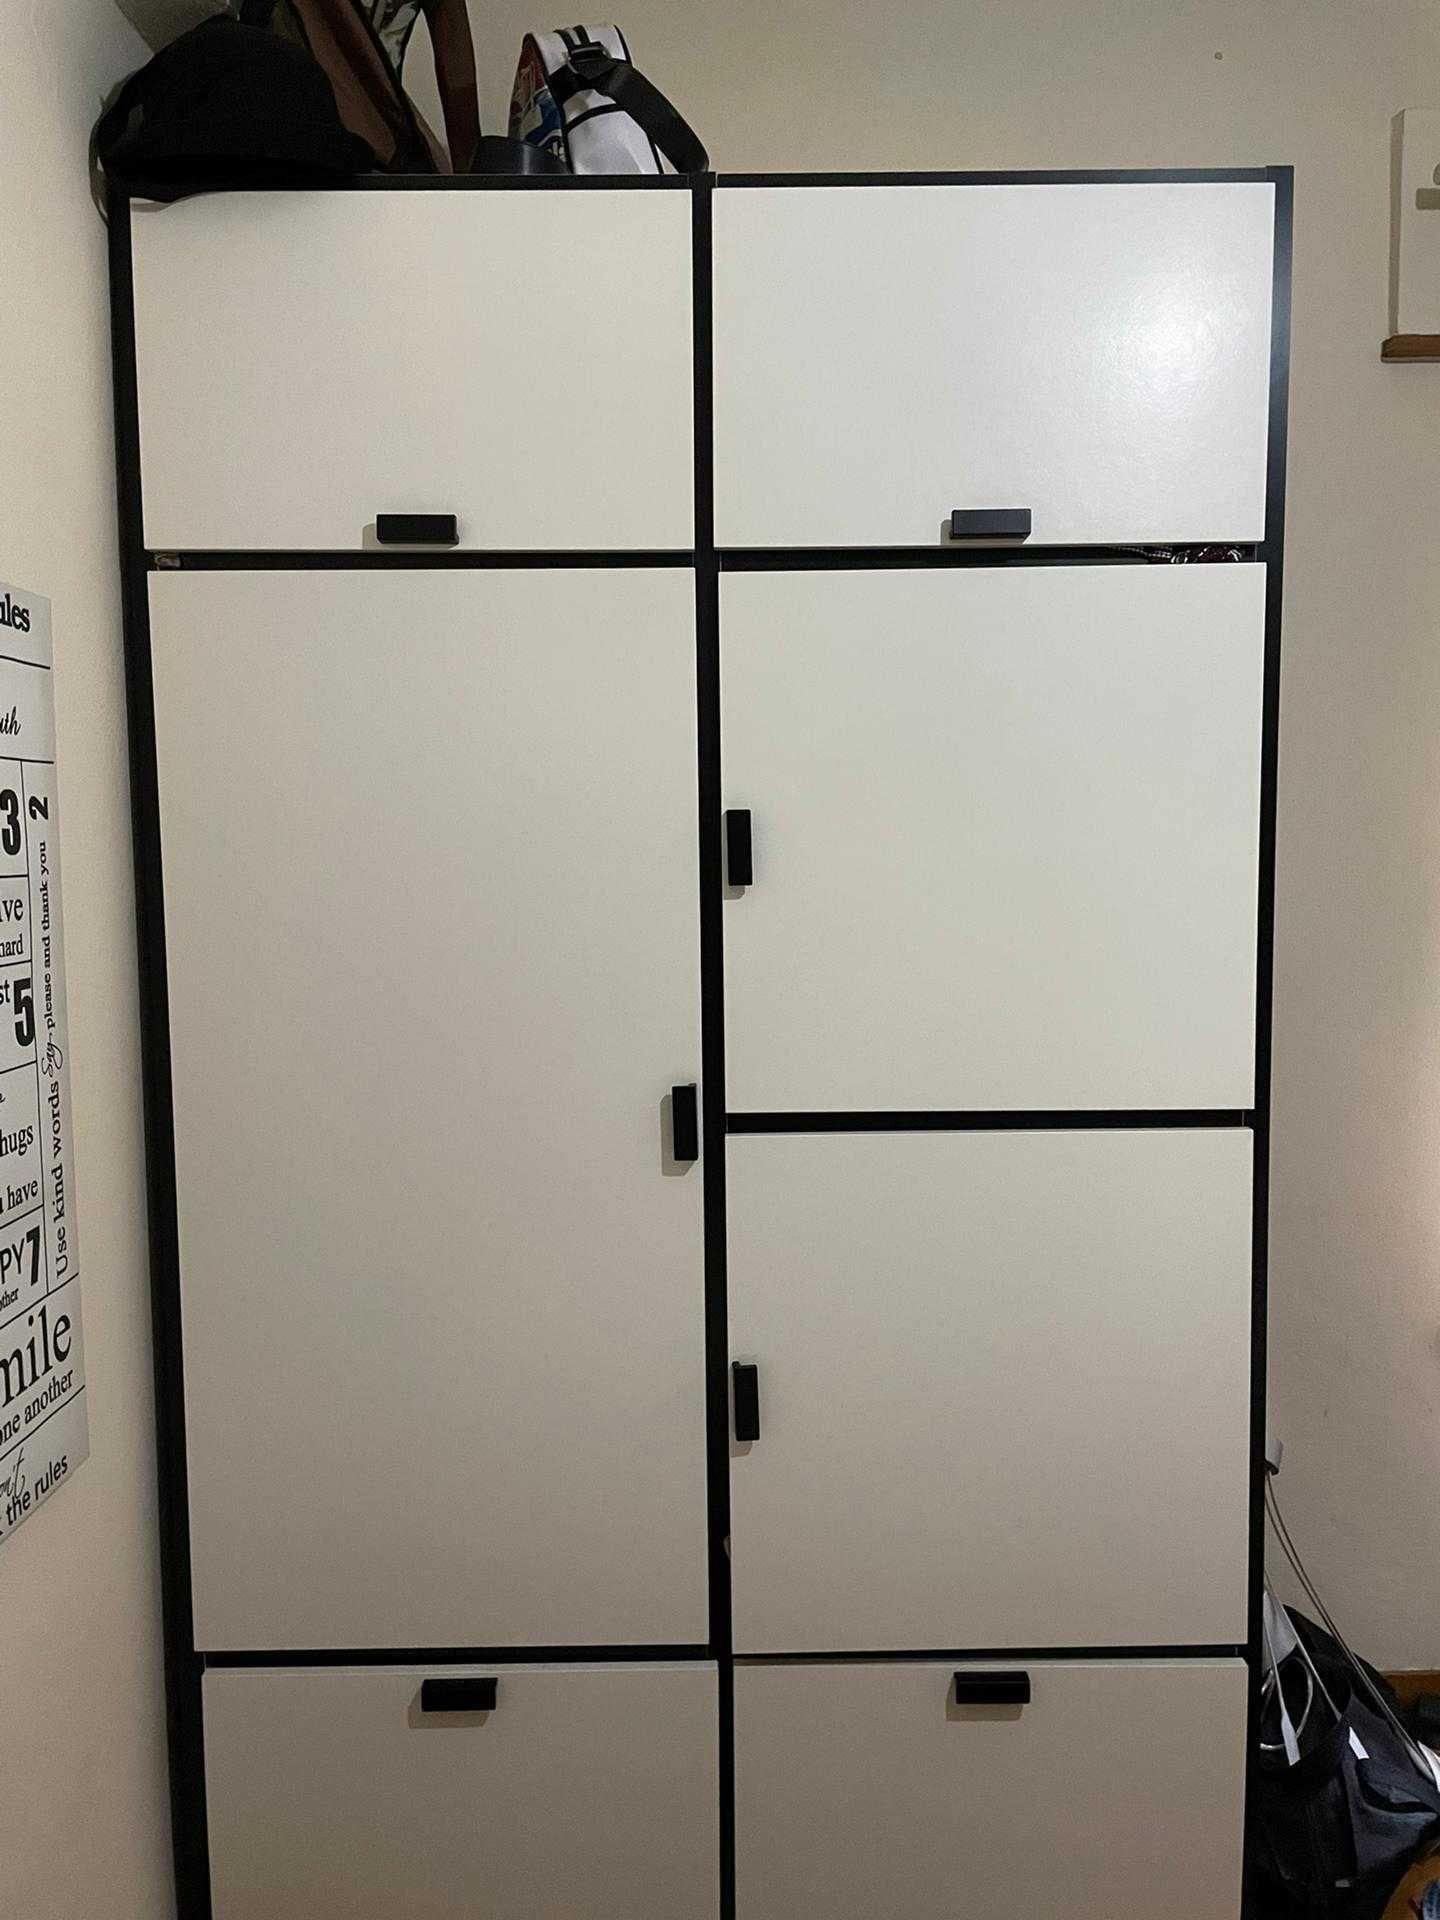 Roupeiro IKEA - Branco e preto